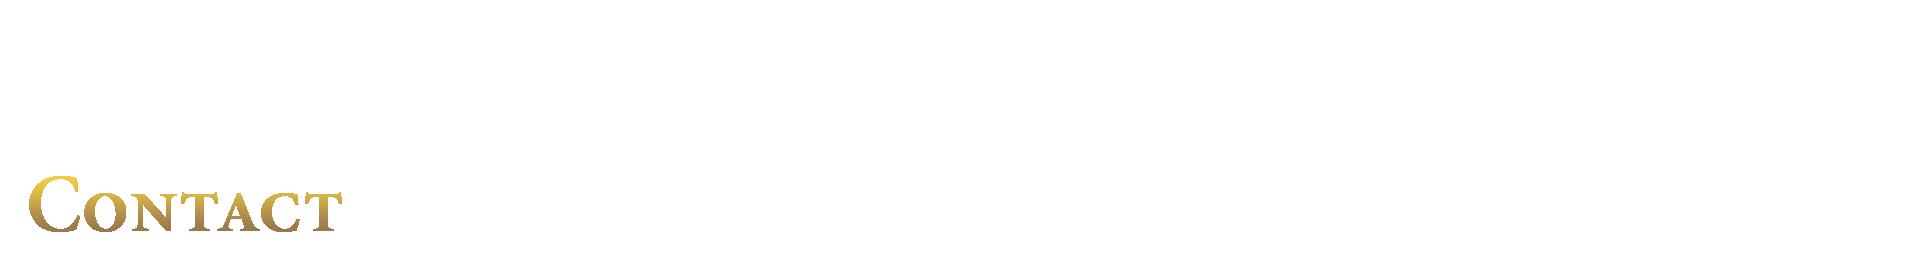 tekst-banner-contact